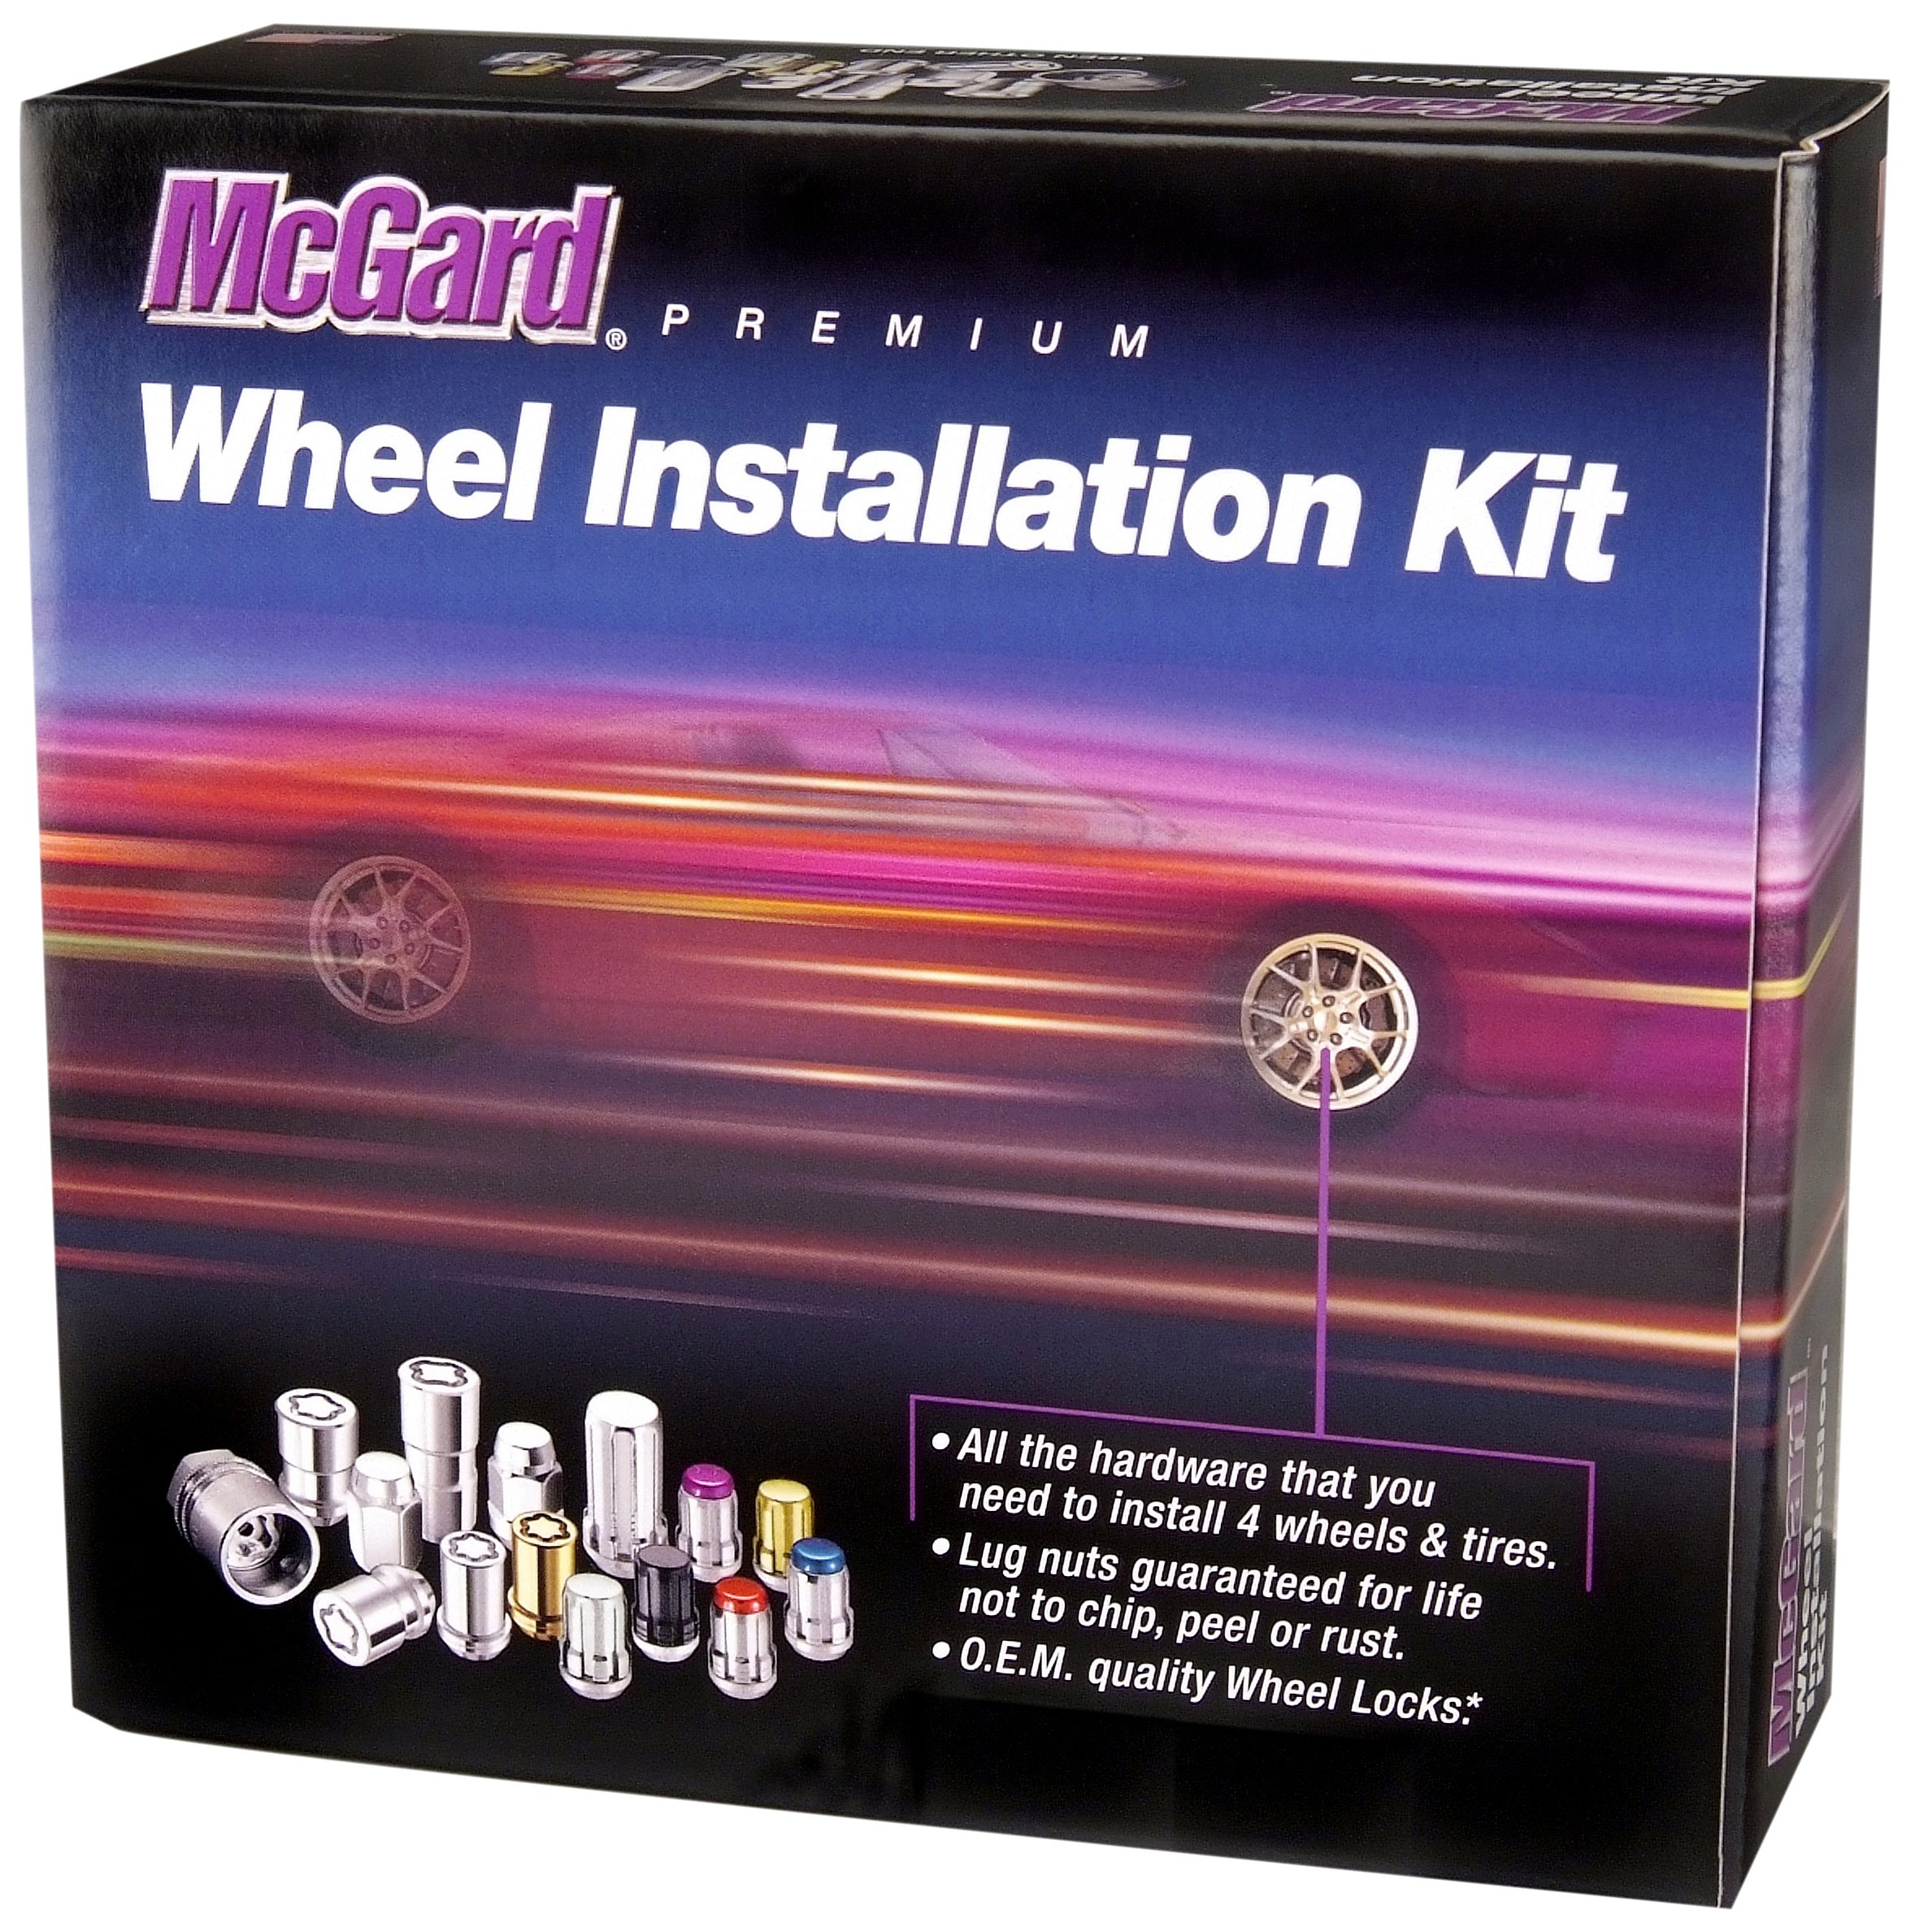 McGard 84527 Chrome/Black Cone Seat Wheel Installation Kit